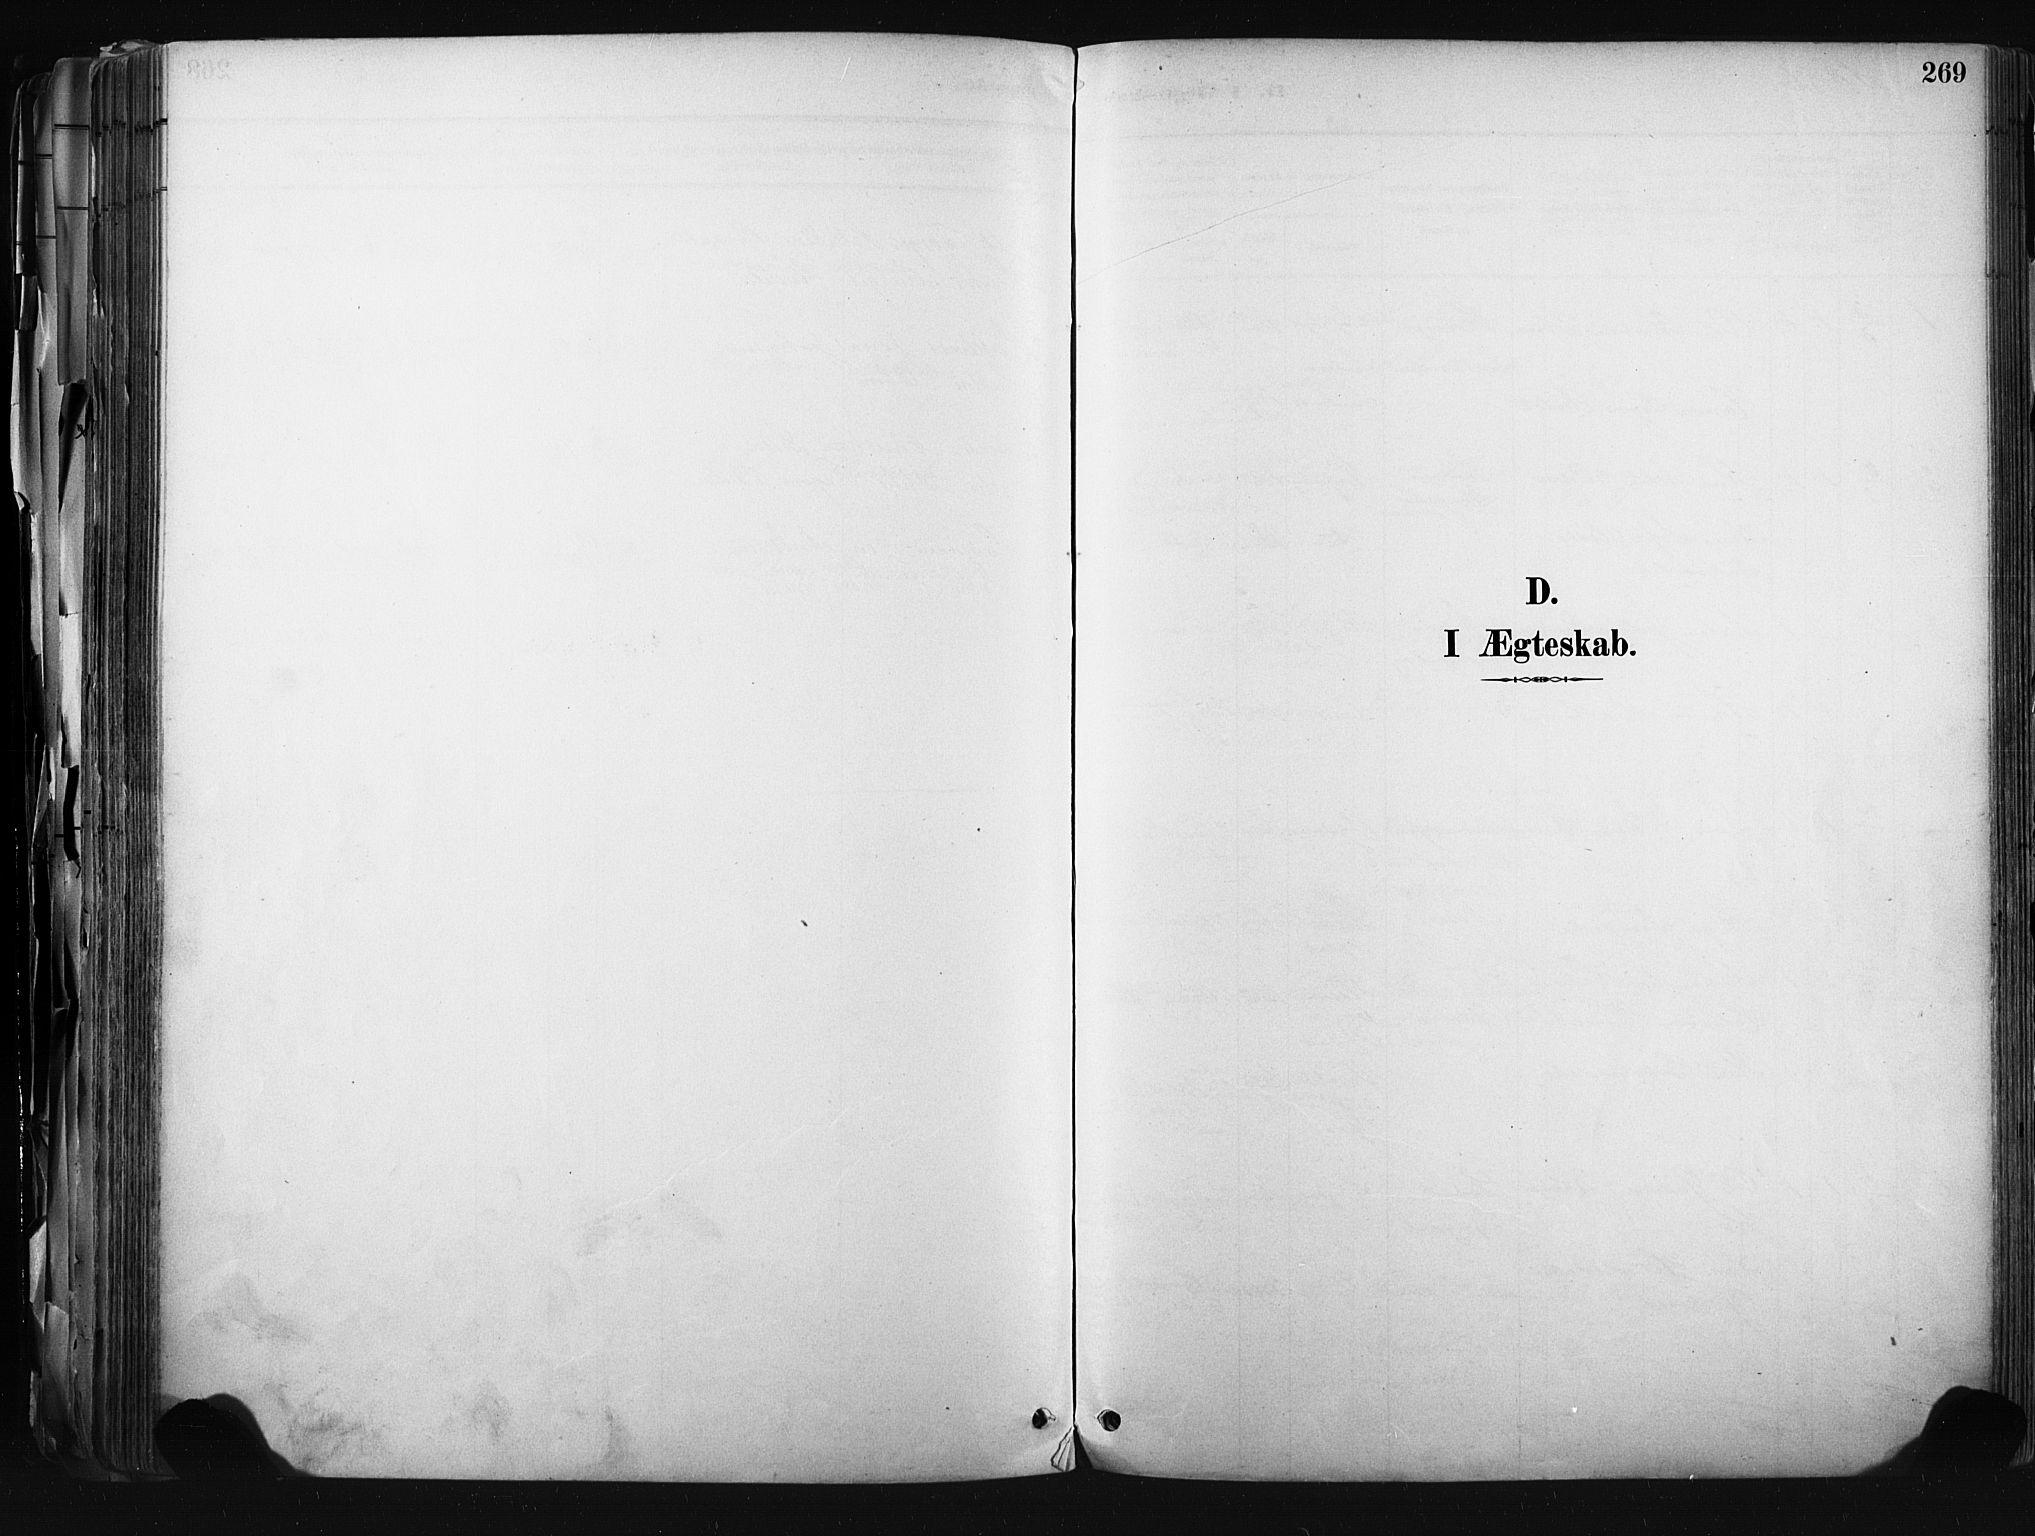 SAKO, Kongsberg kirkebøker, F/Fb/L0002: Ministerialbok nr. II 2, 1886-1896, s. 269